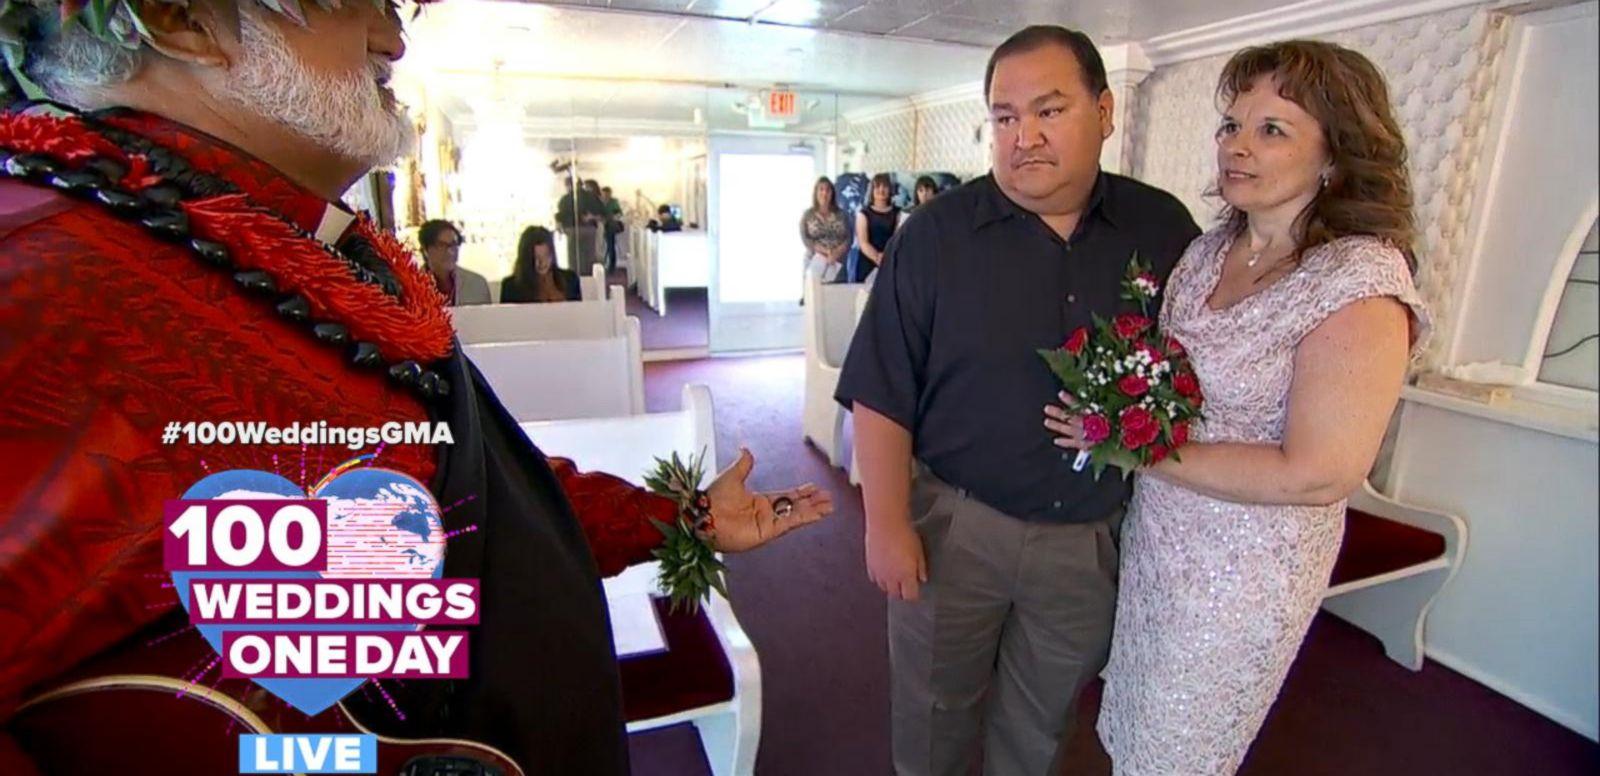 VIDEO: Hilarious Hawaiian Officiant Marries Lovebirds in Las Vegas' Little White Chapel